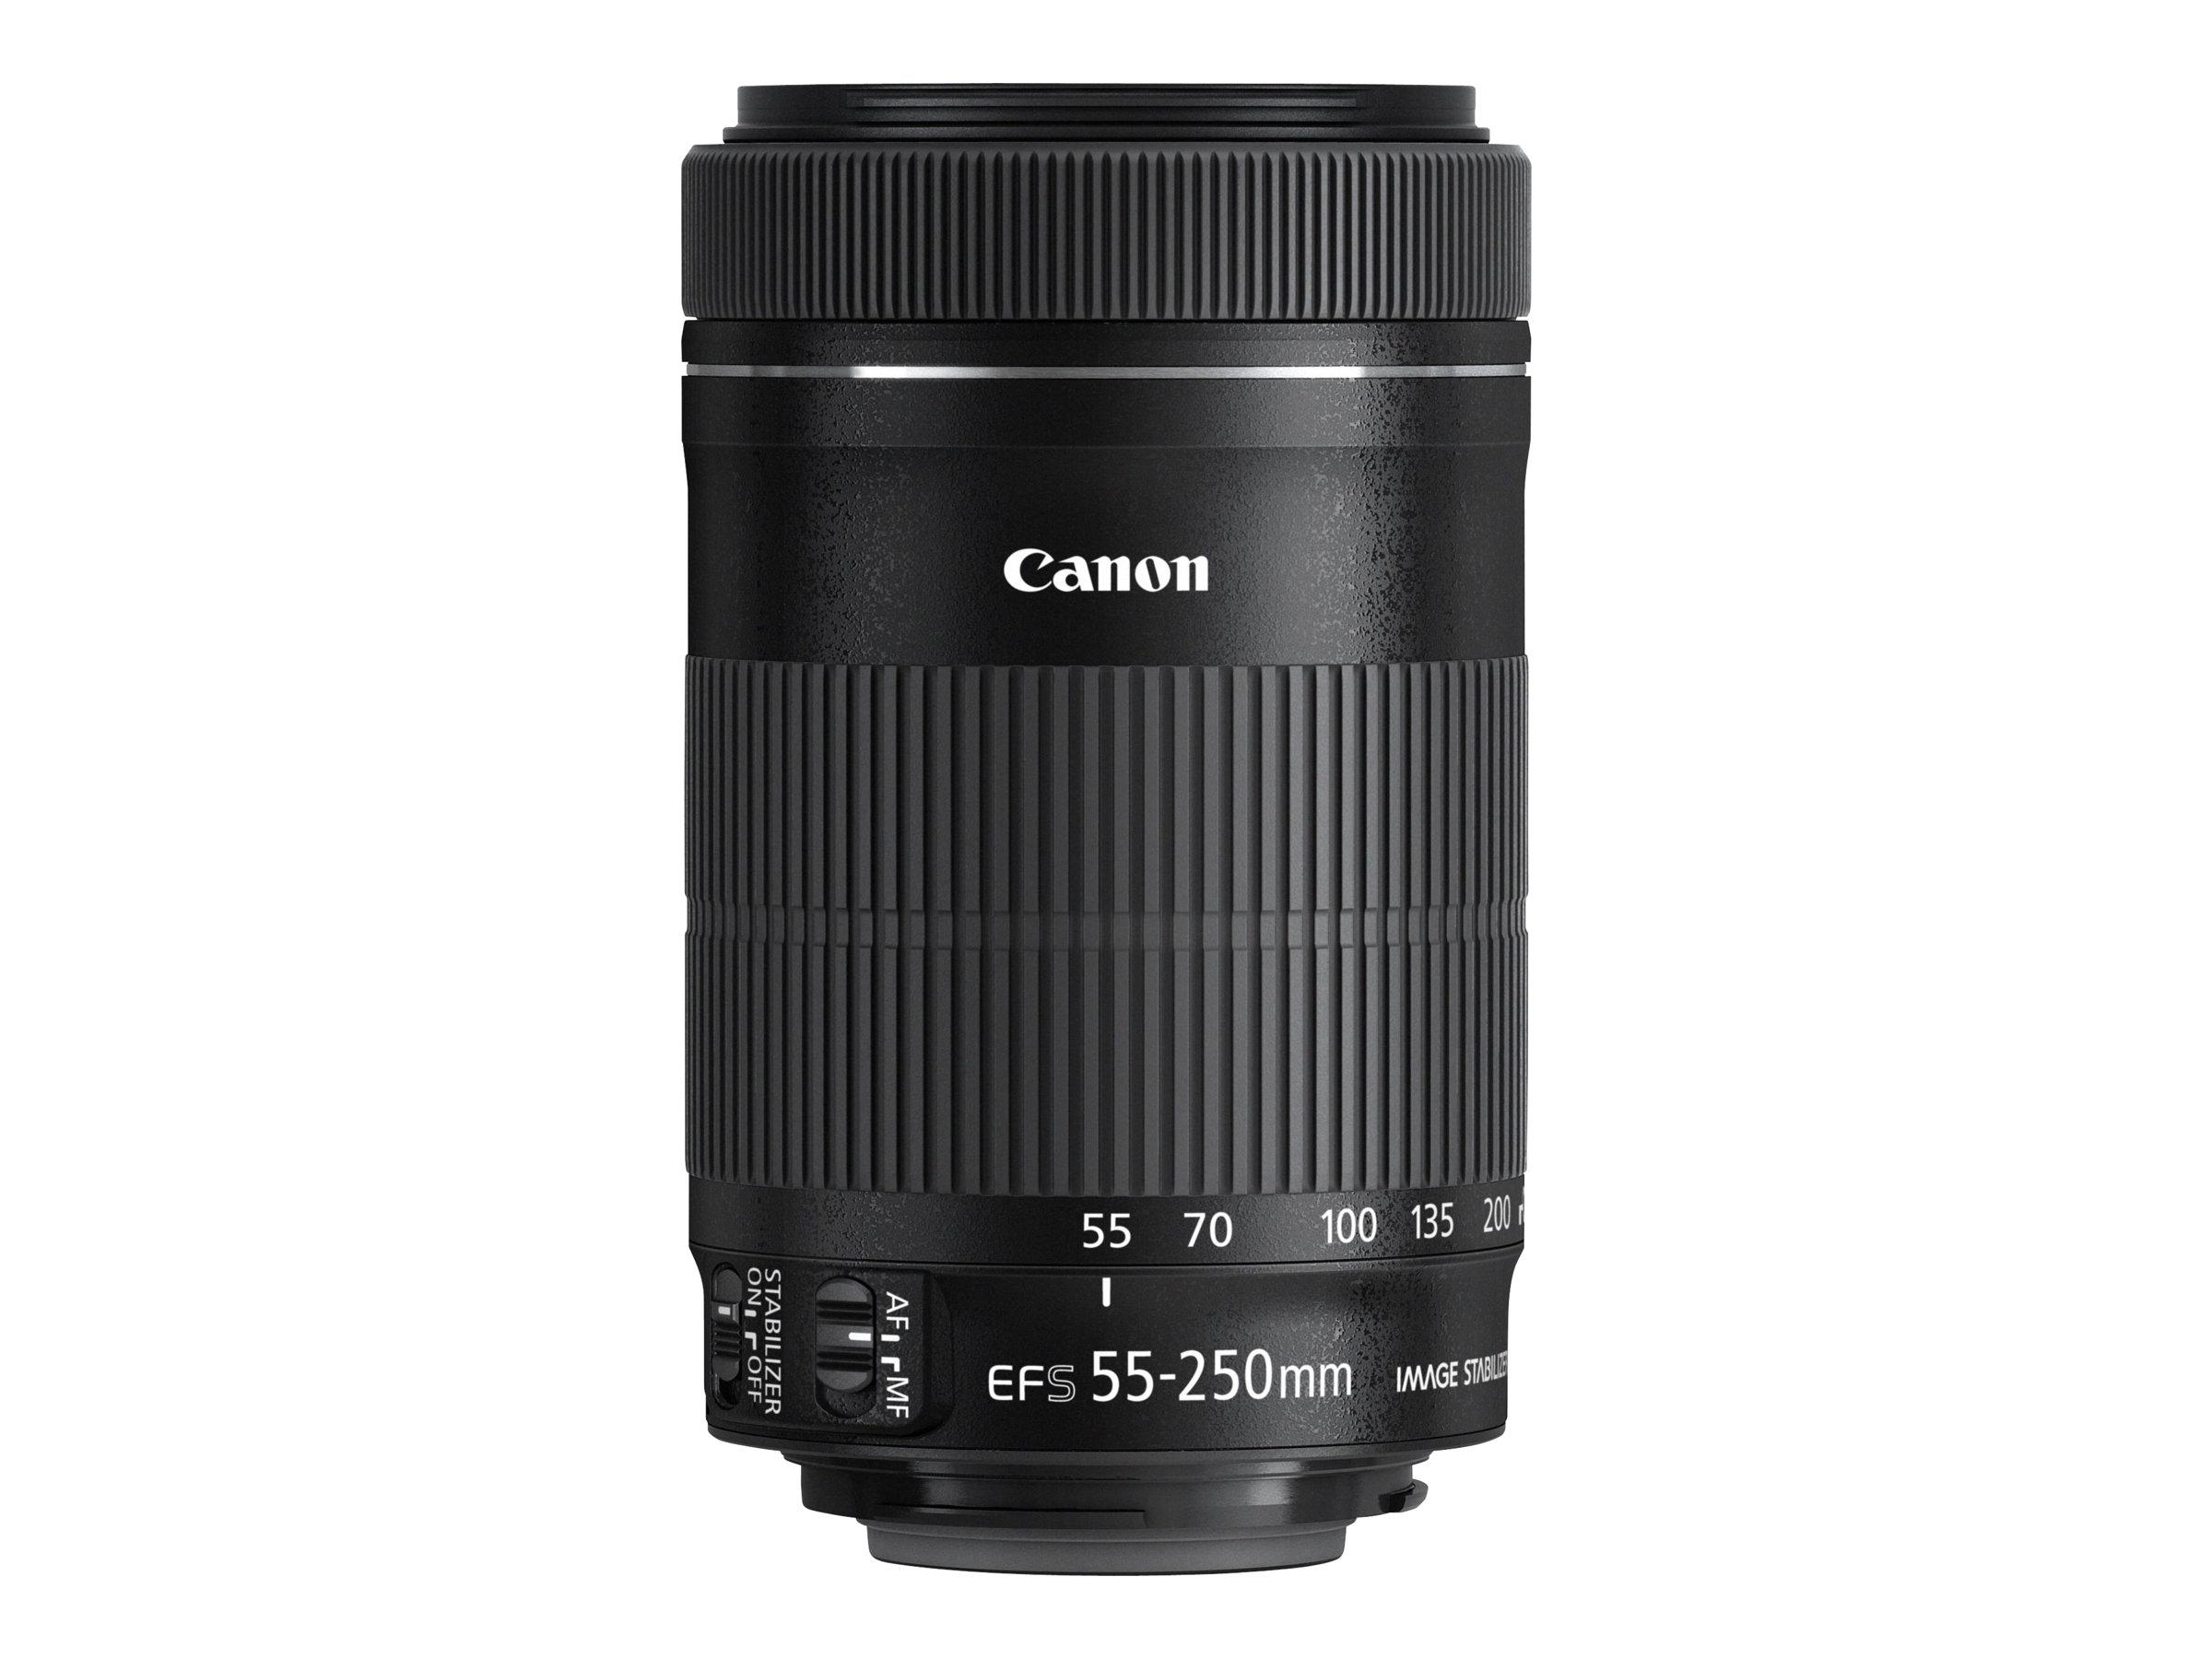 Canon EF-S - Telezoomobjektiv - 55 mm - 250 mm